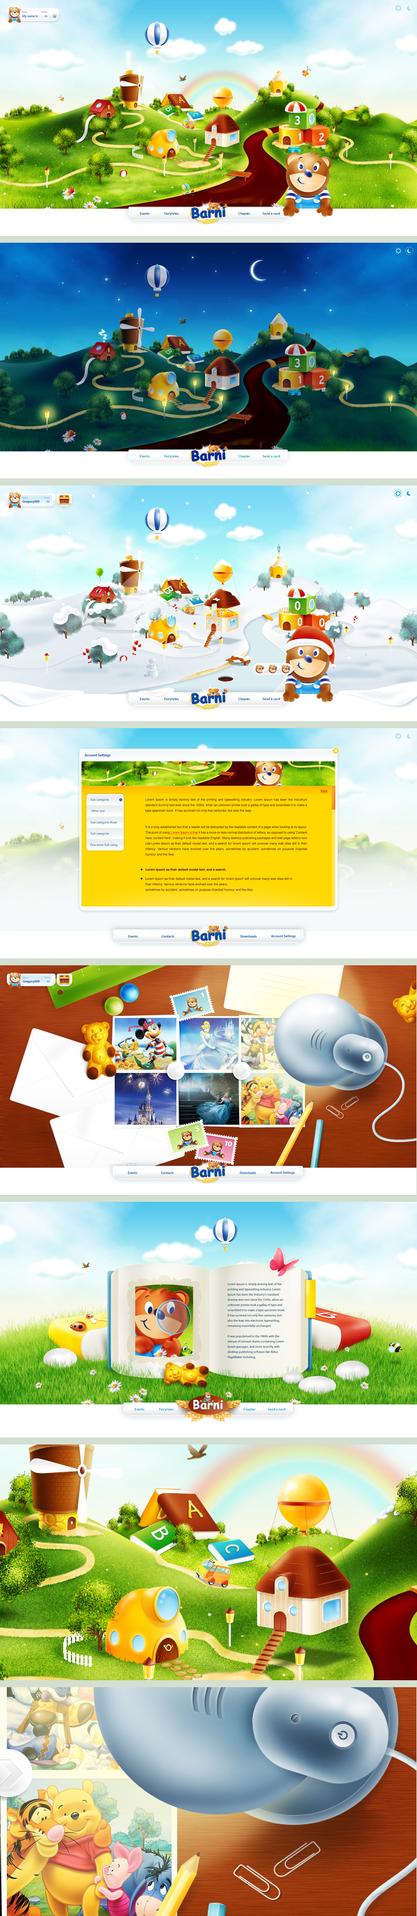 BARNI world - flash web design by gatisatmixlv